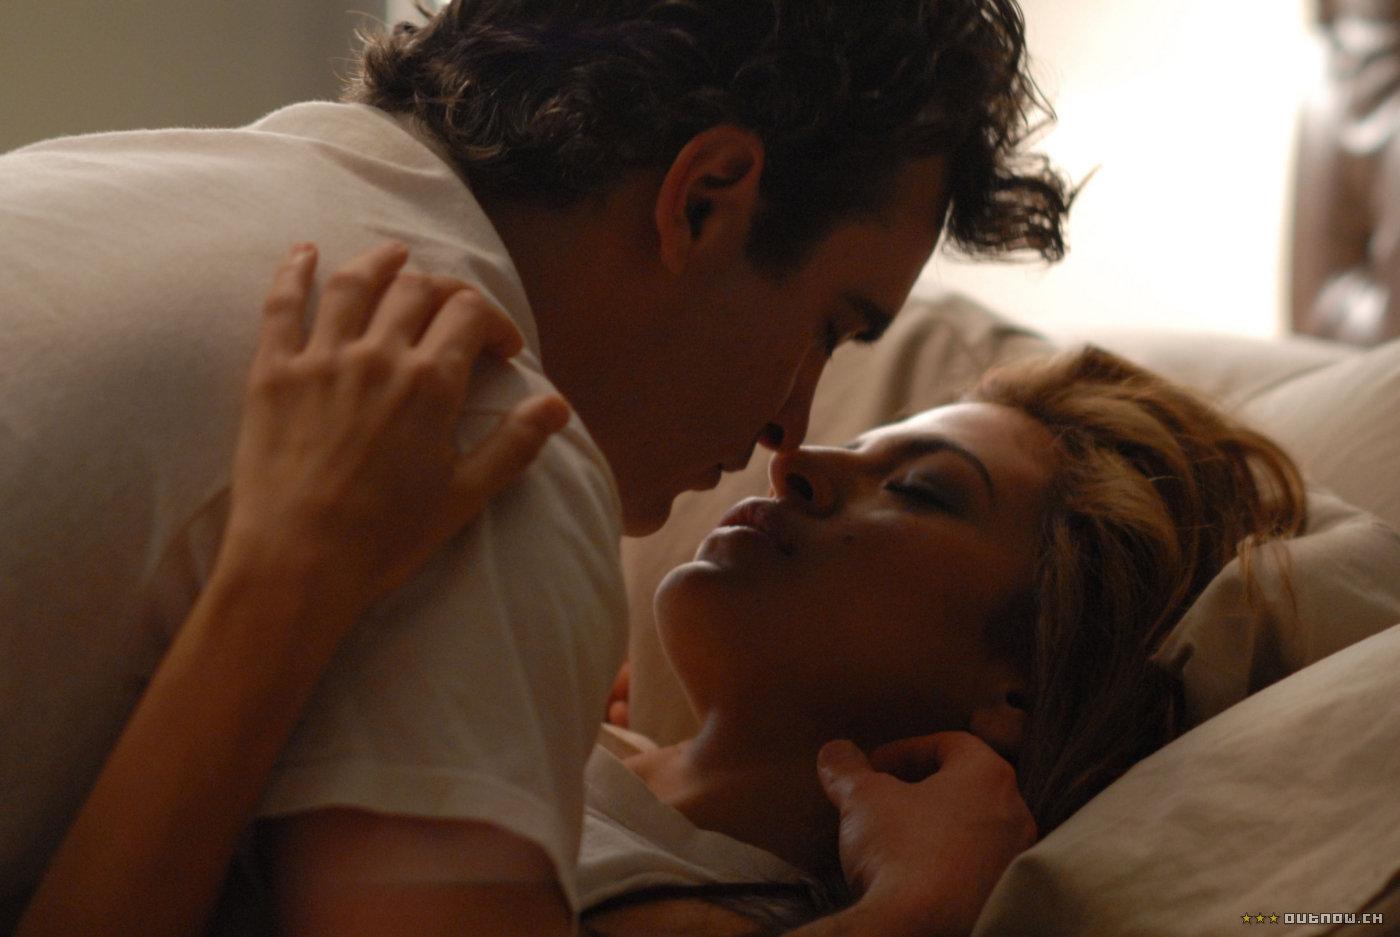 фото с поцелуем на ночь